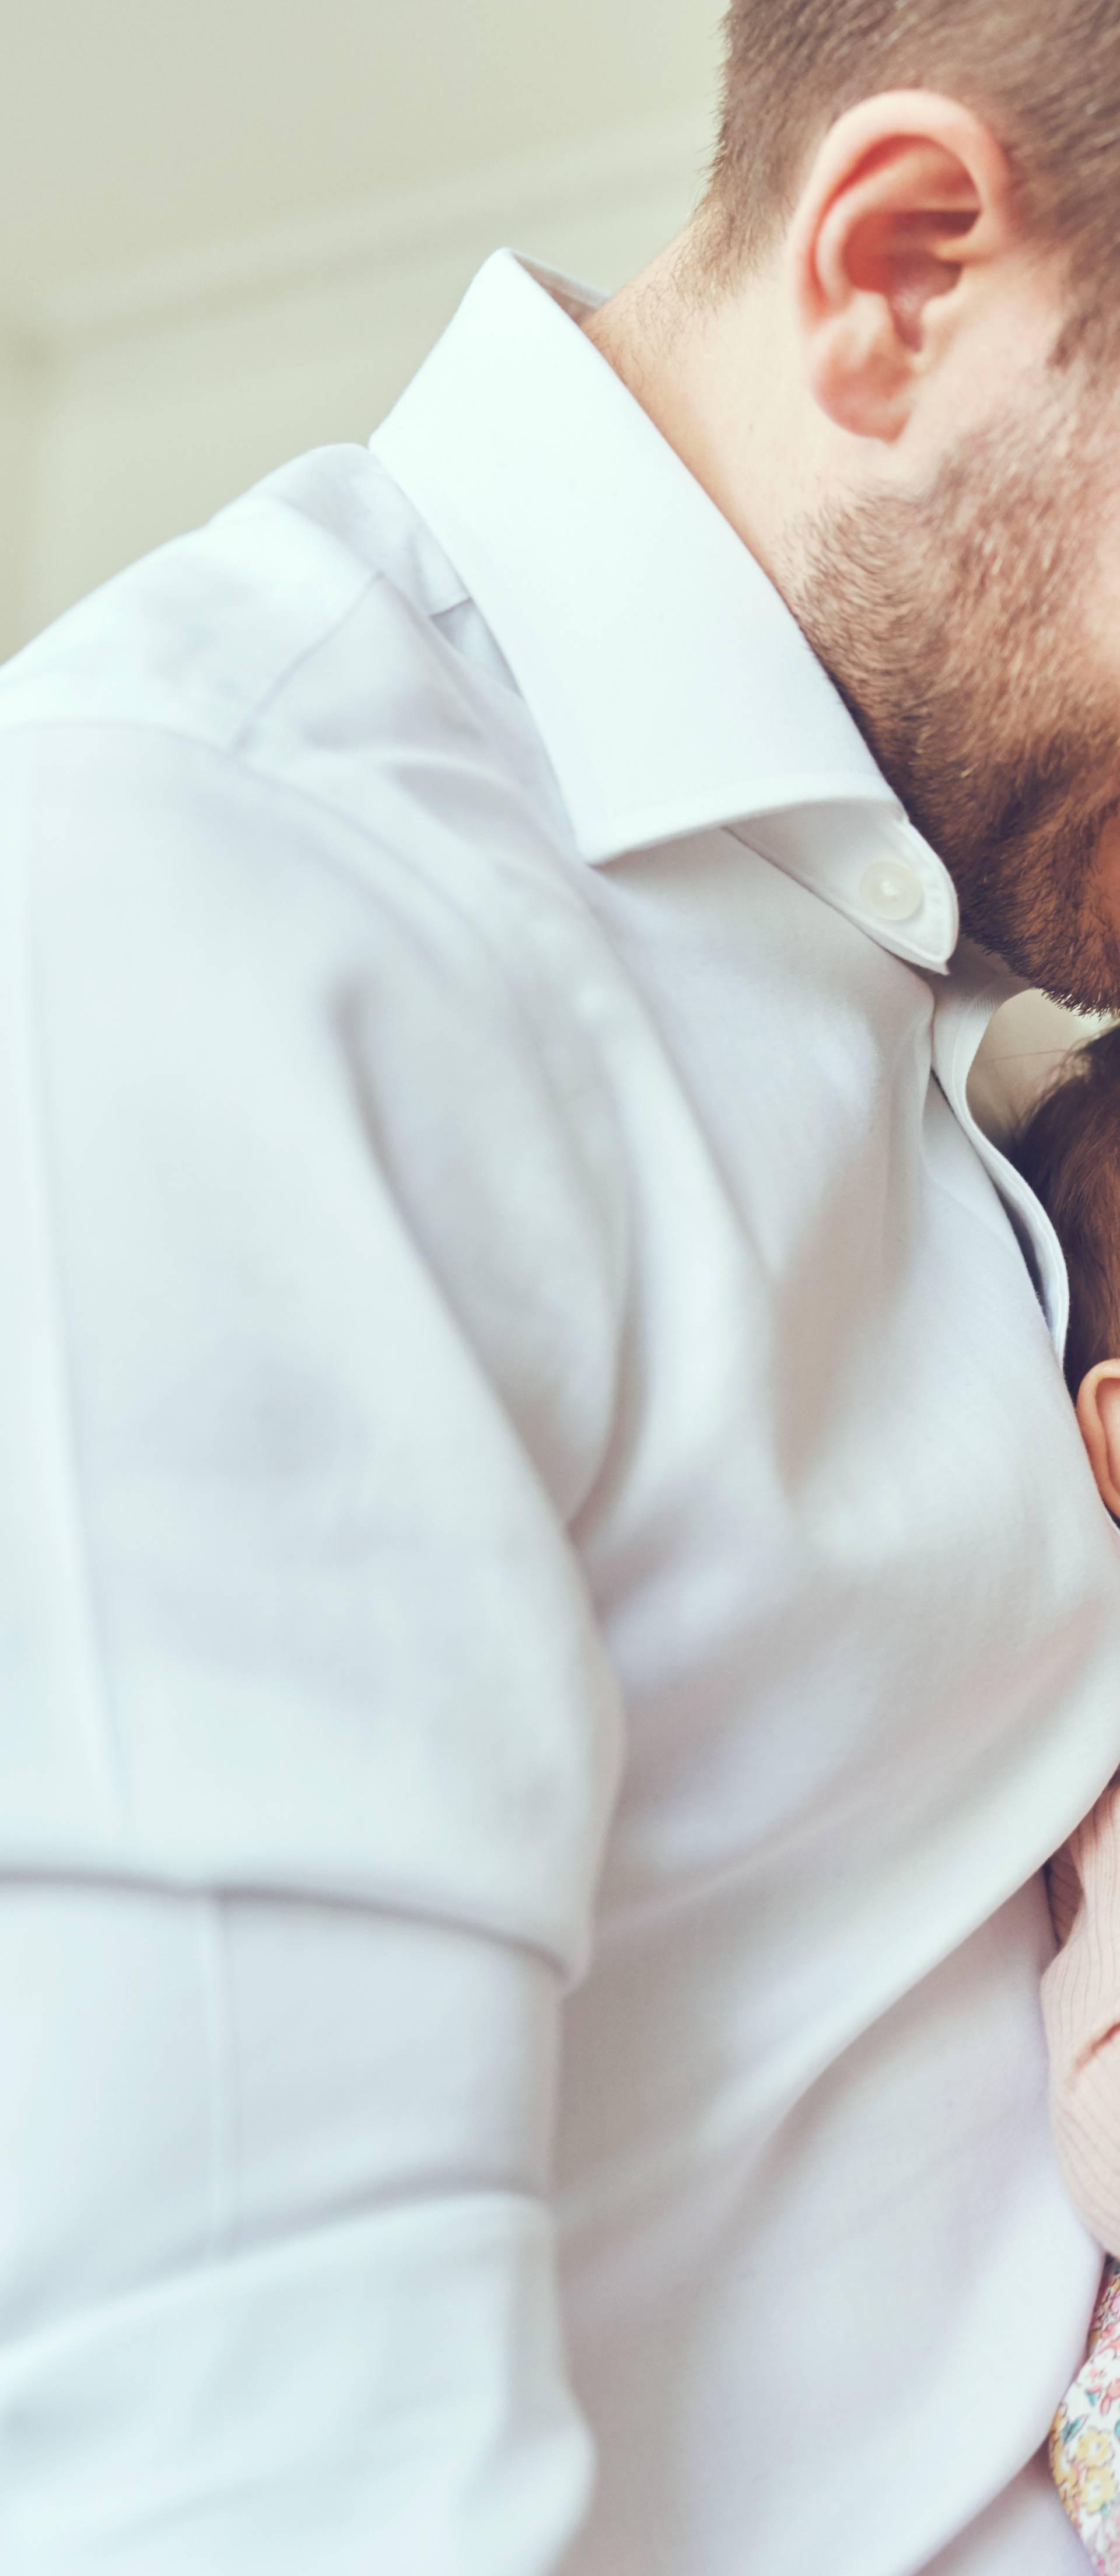 Opasni RSV virus: Ne ljubite bebe ako mislite da ste bolesni